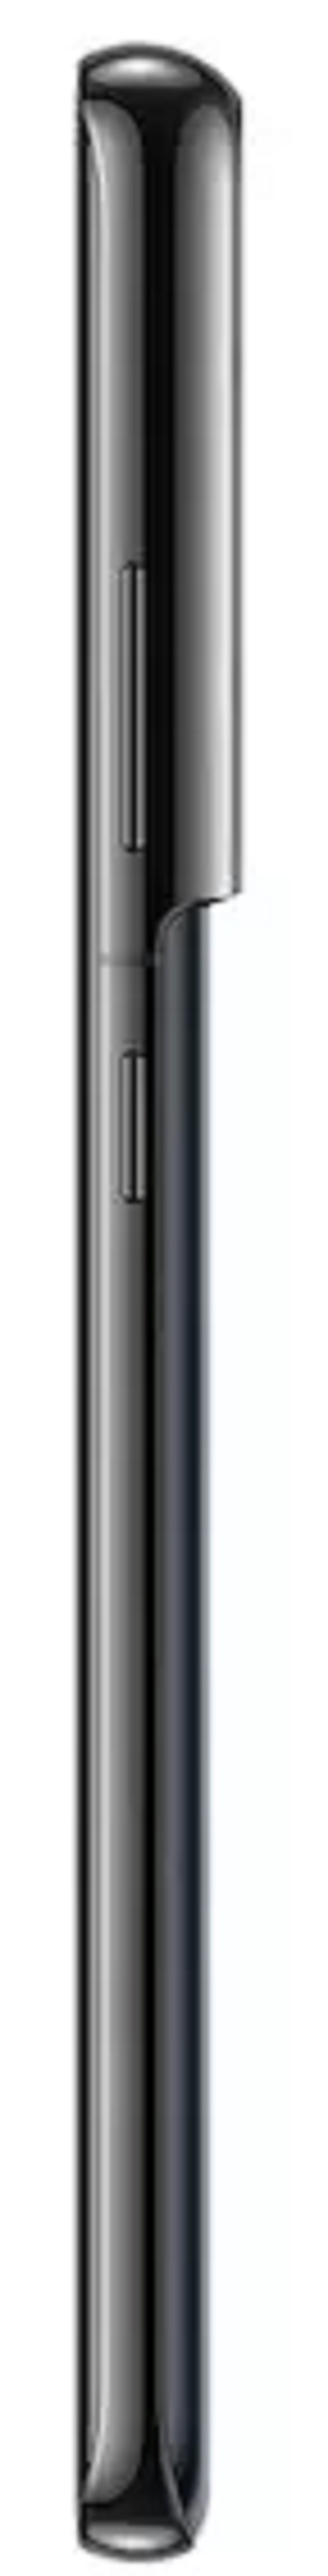 thumbnail 18 - Samsung Galaxy G998U S21 Ultra 5G 128GB Unlocked Smartphone - Excellent